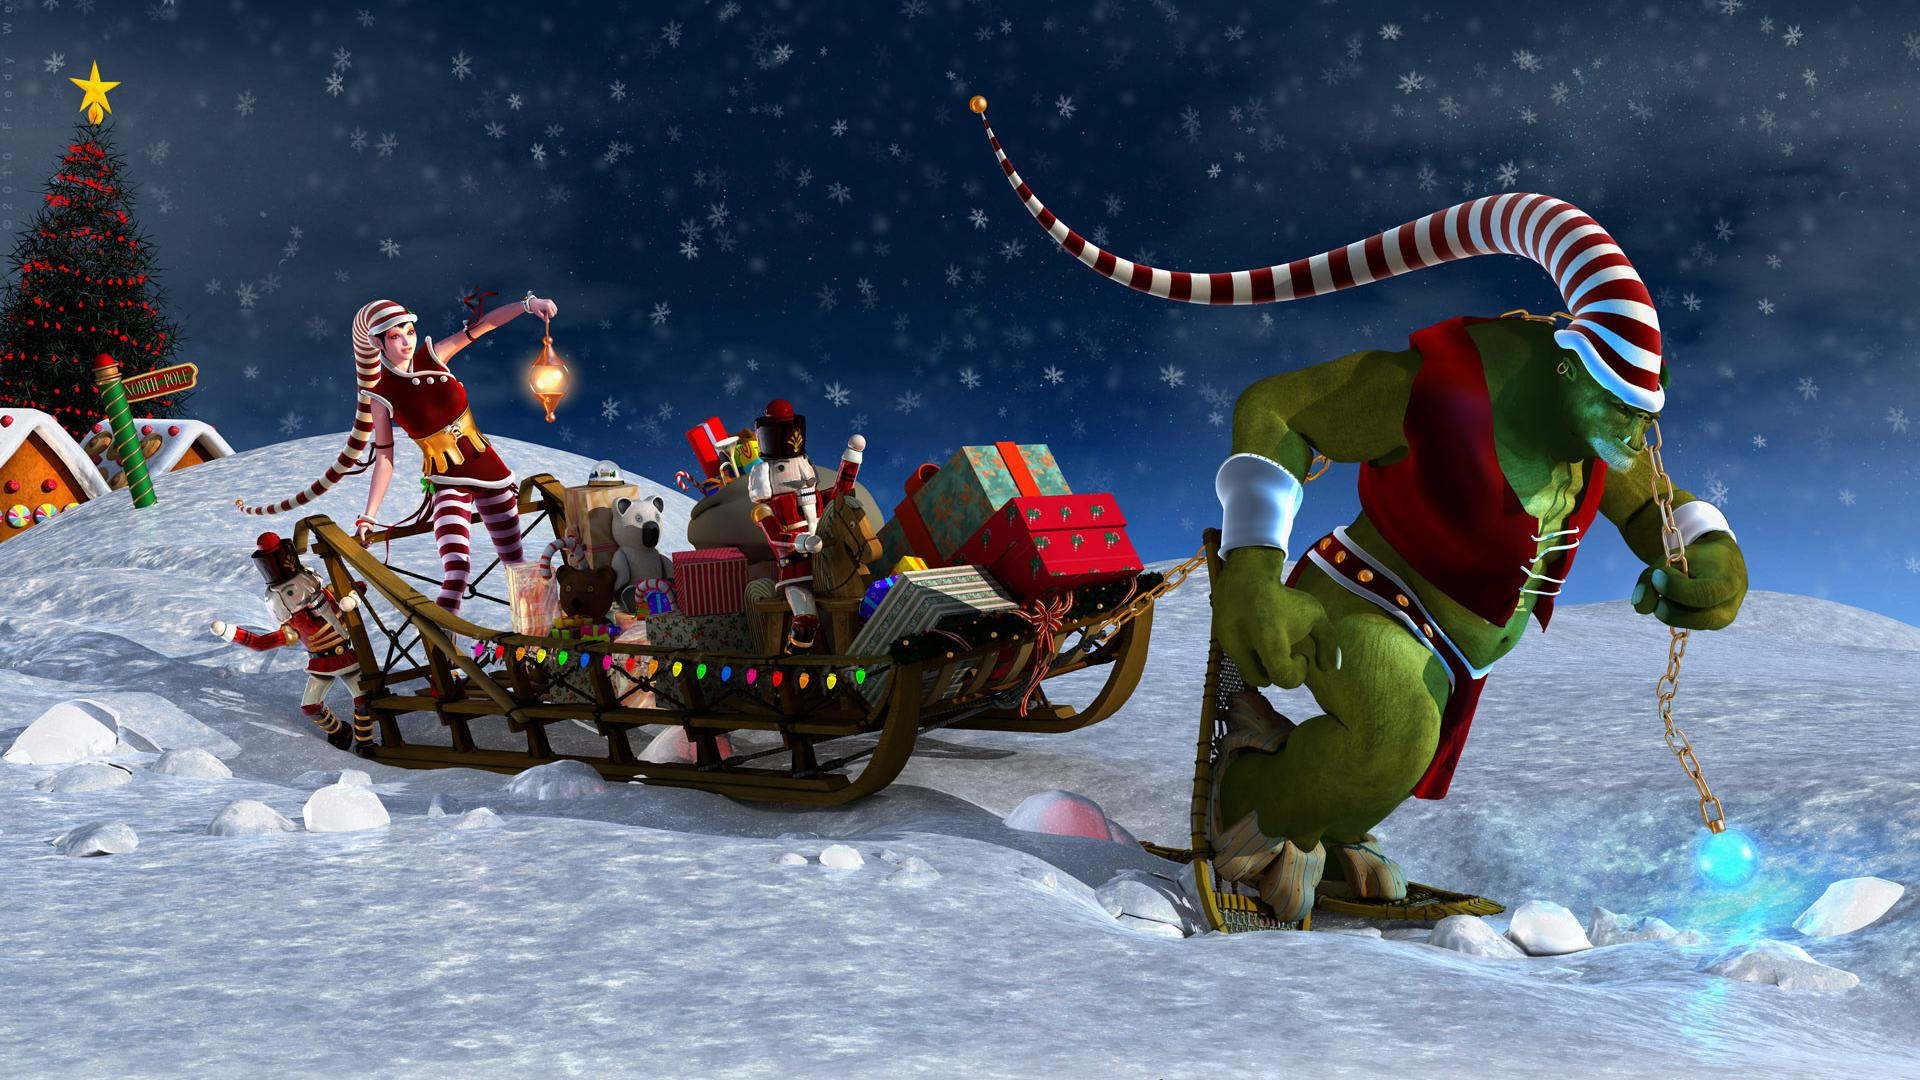 Санта клаус сани ёлка подарки аниме